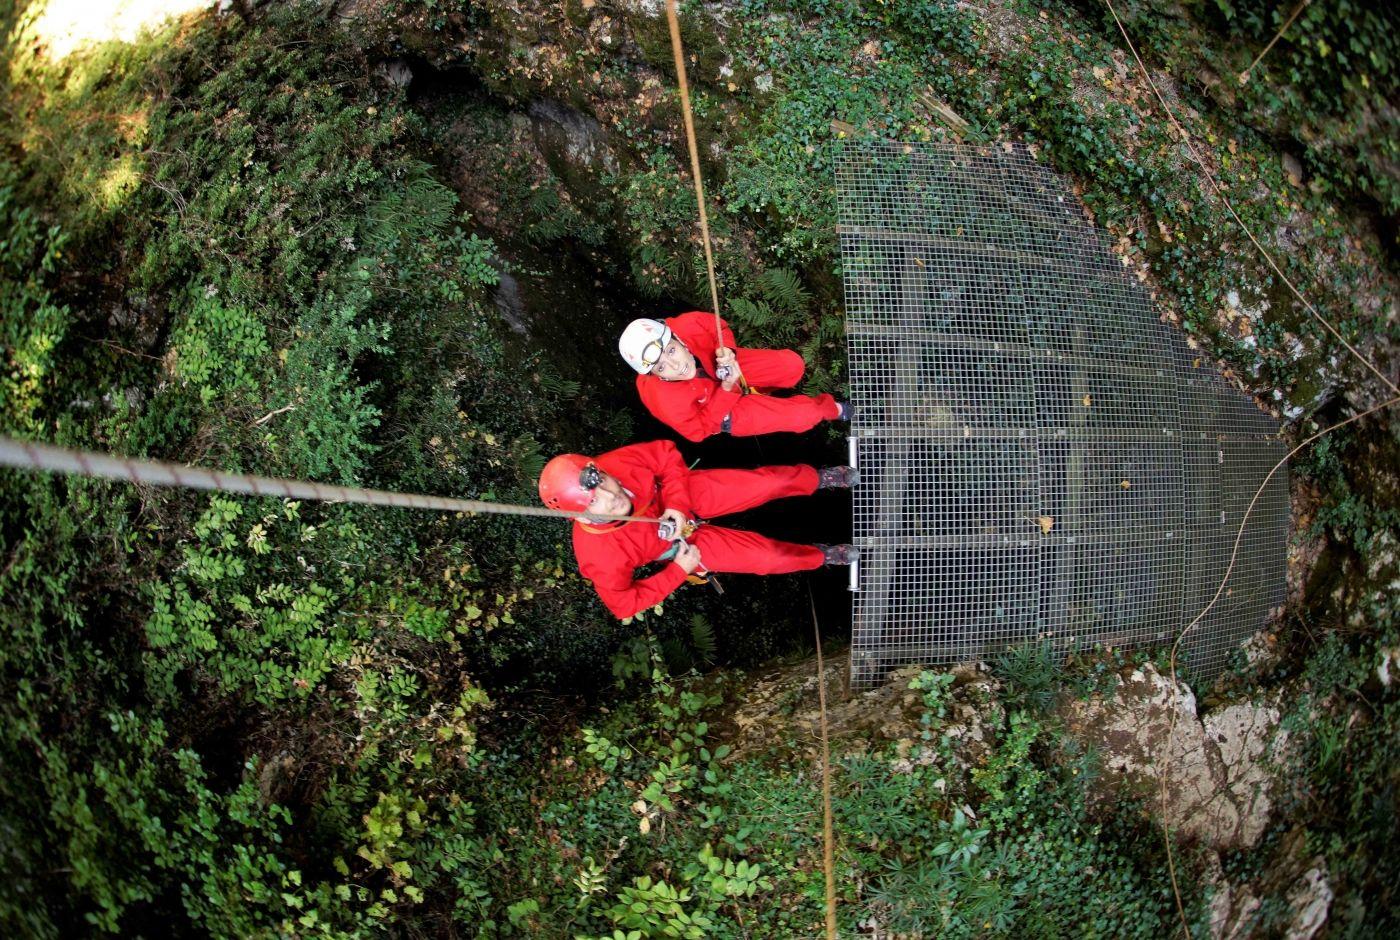 ardeche_speleo_adrenaline_descente_panoramique_rappel_orgnac_yannis_rungjpg.jpg